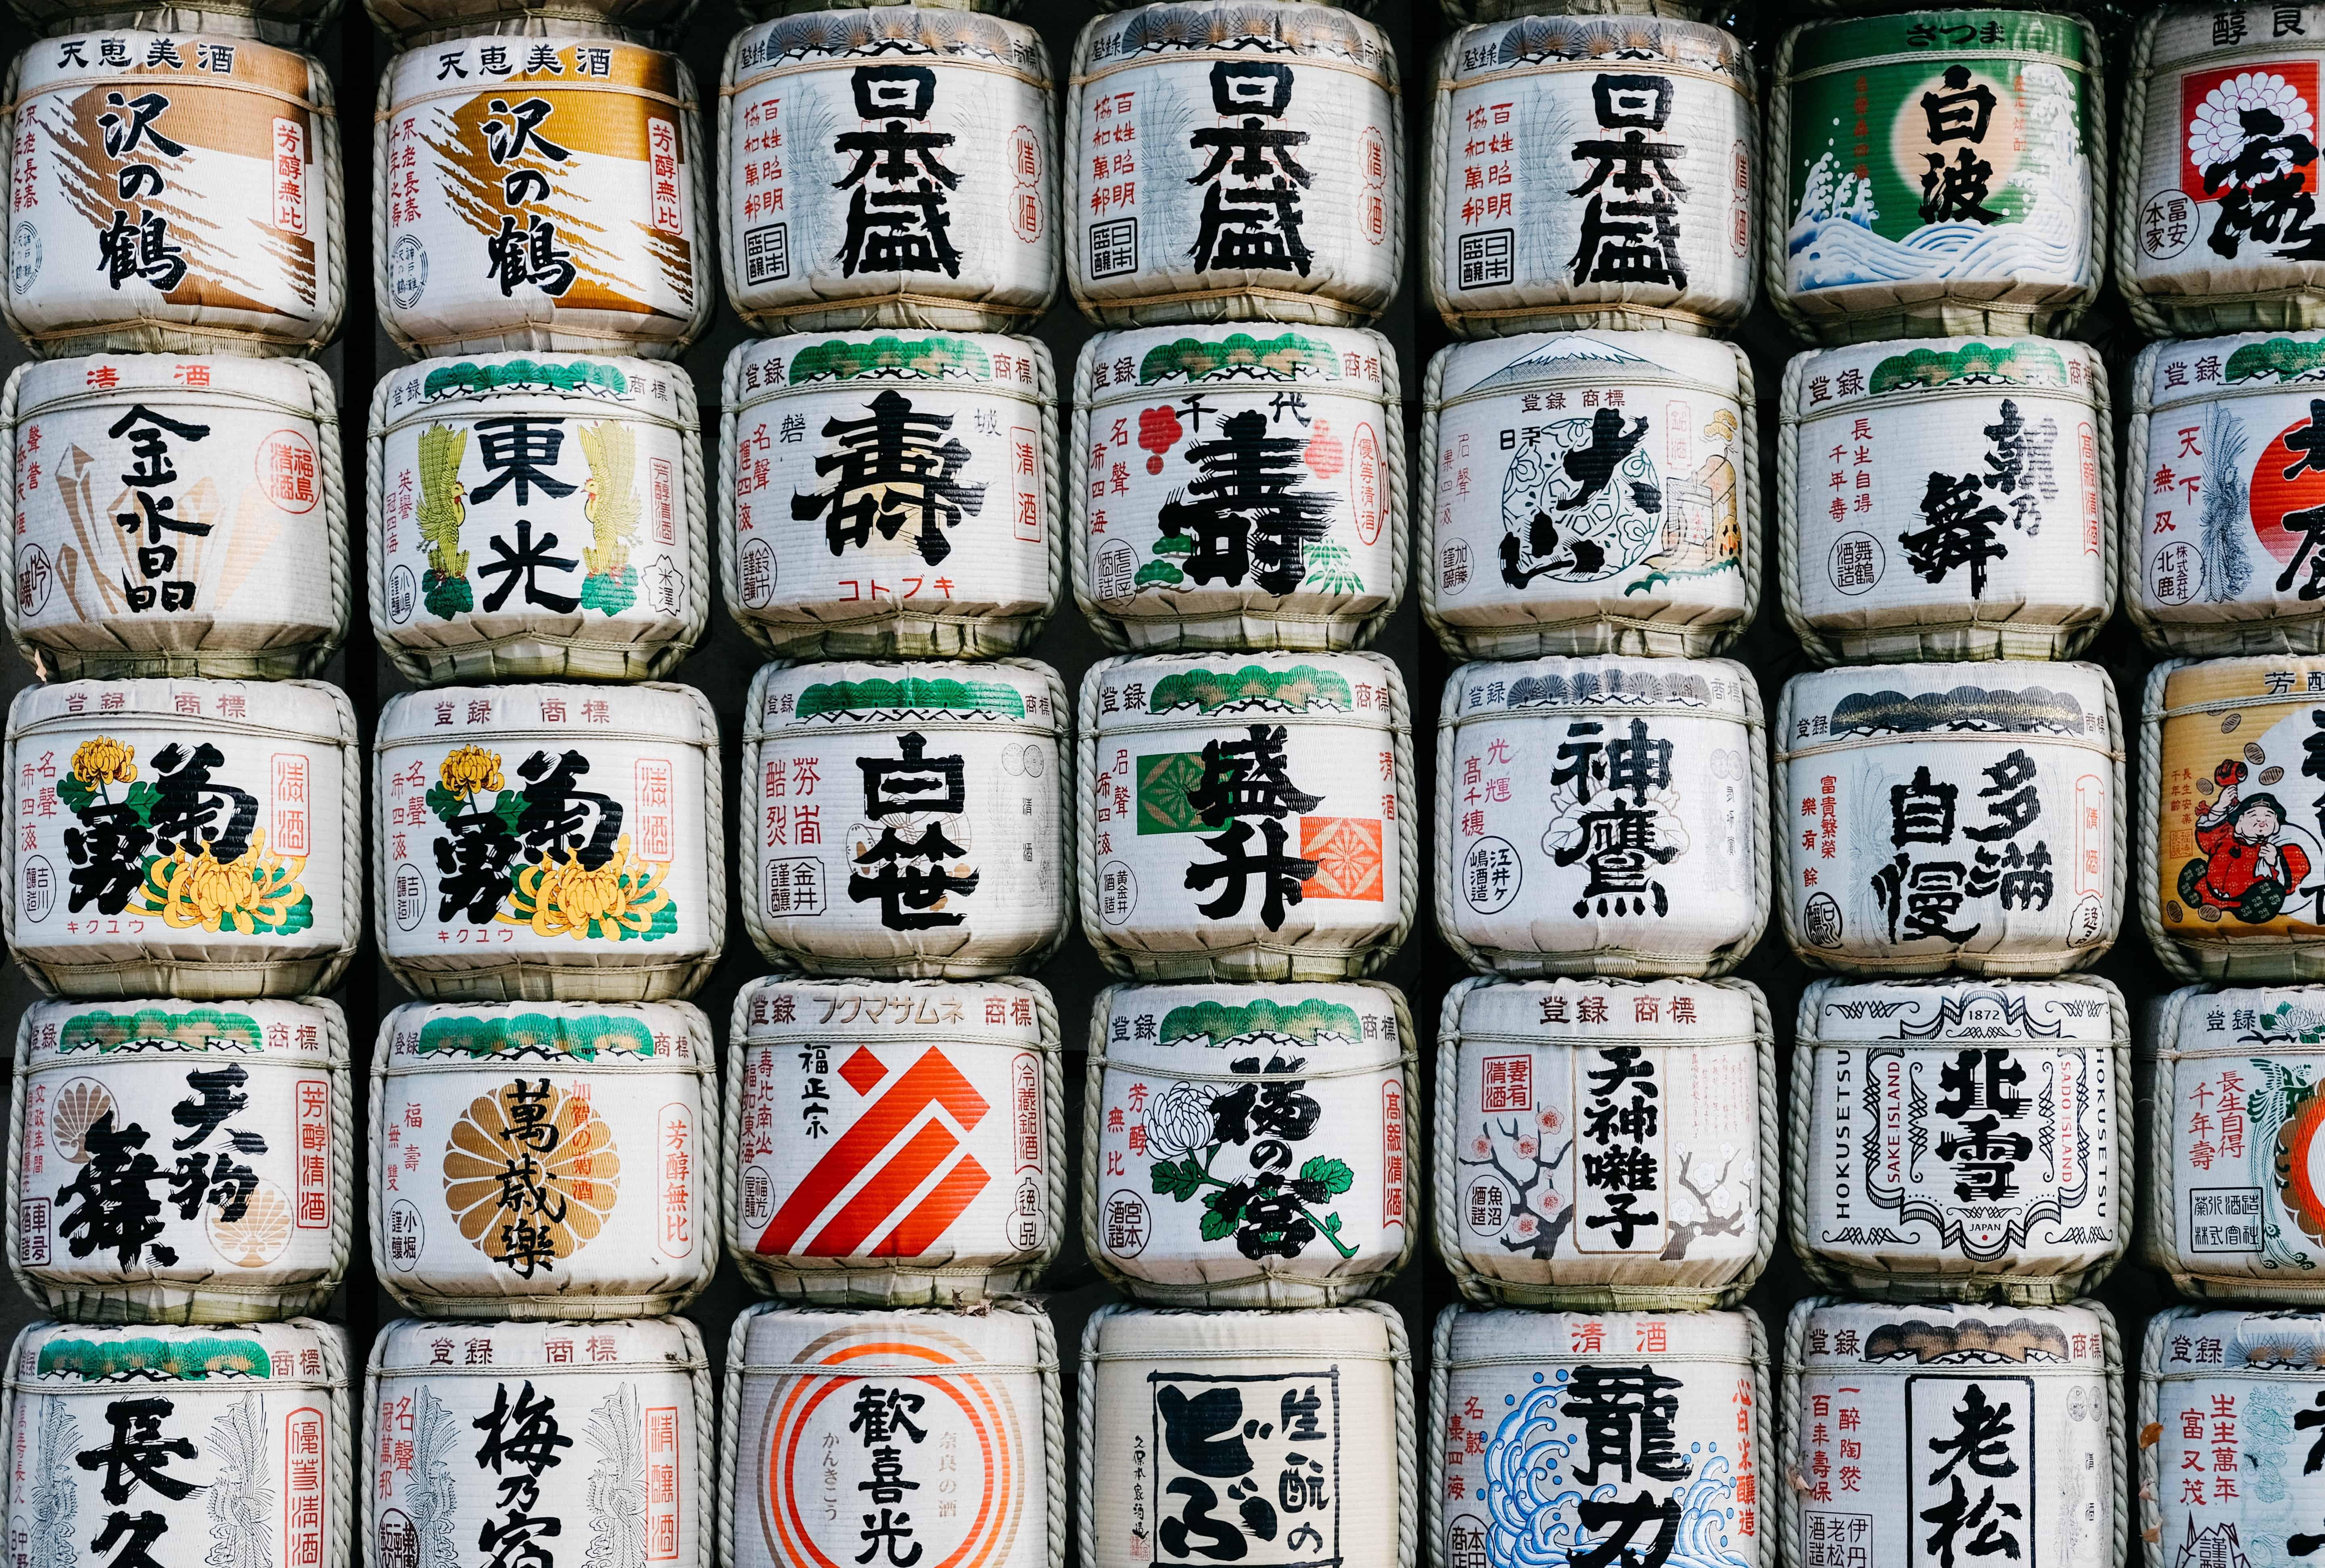 sake barrels with Japanese text